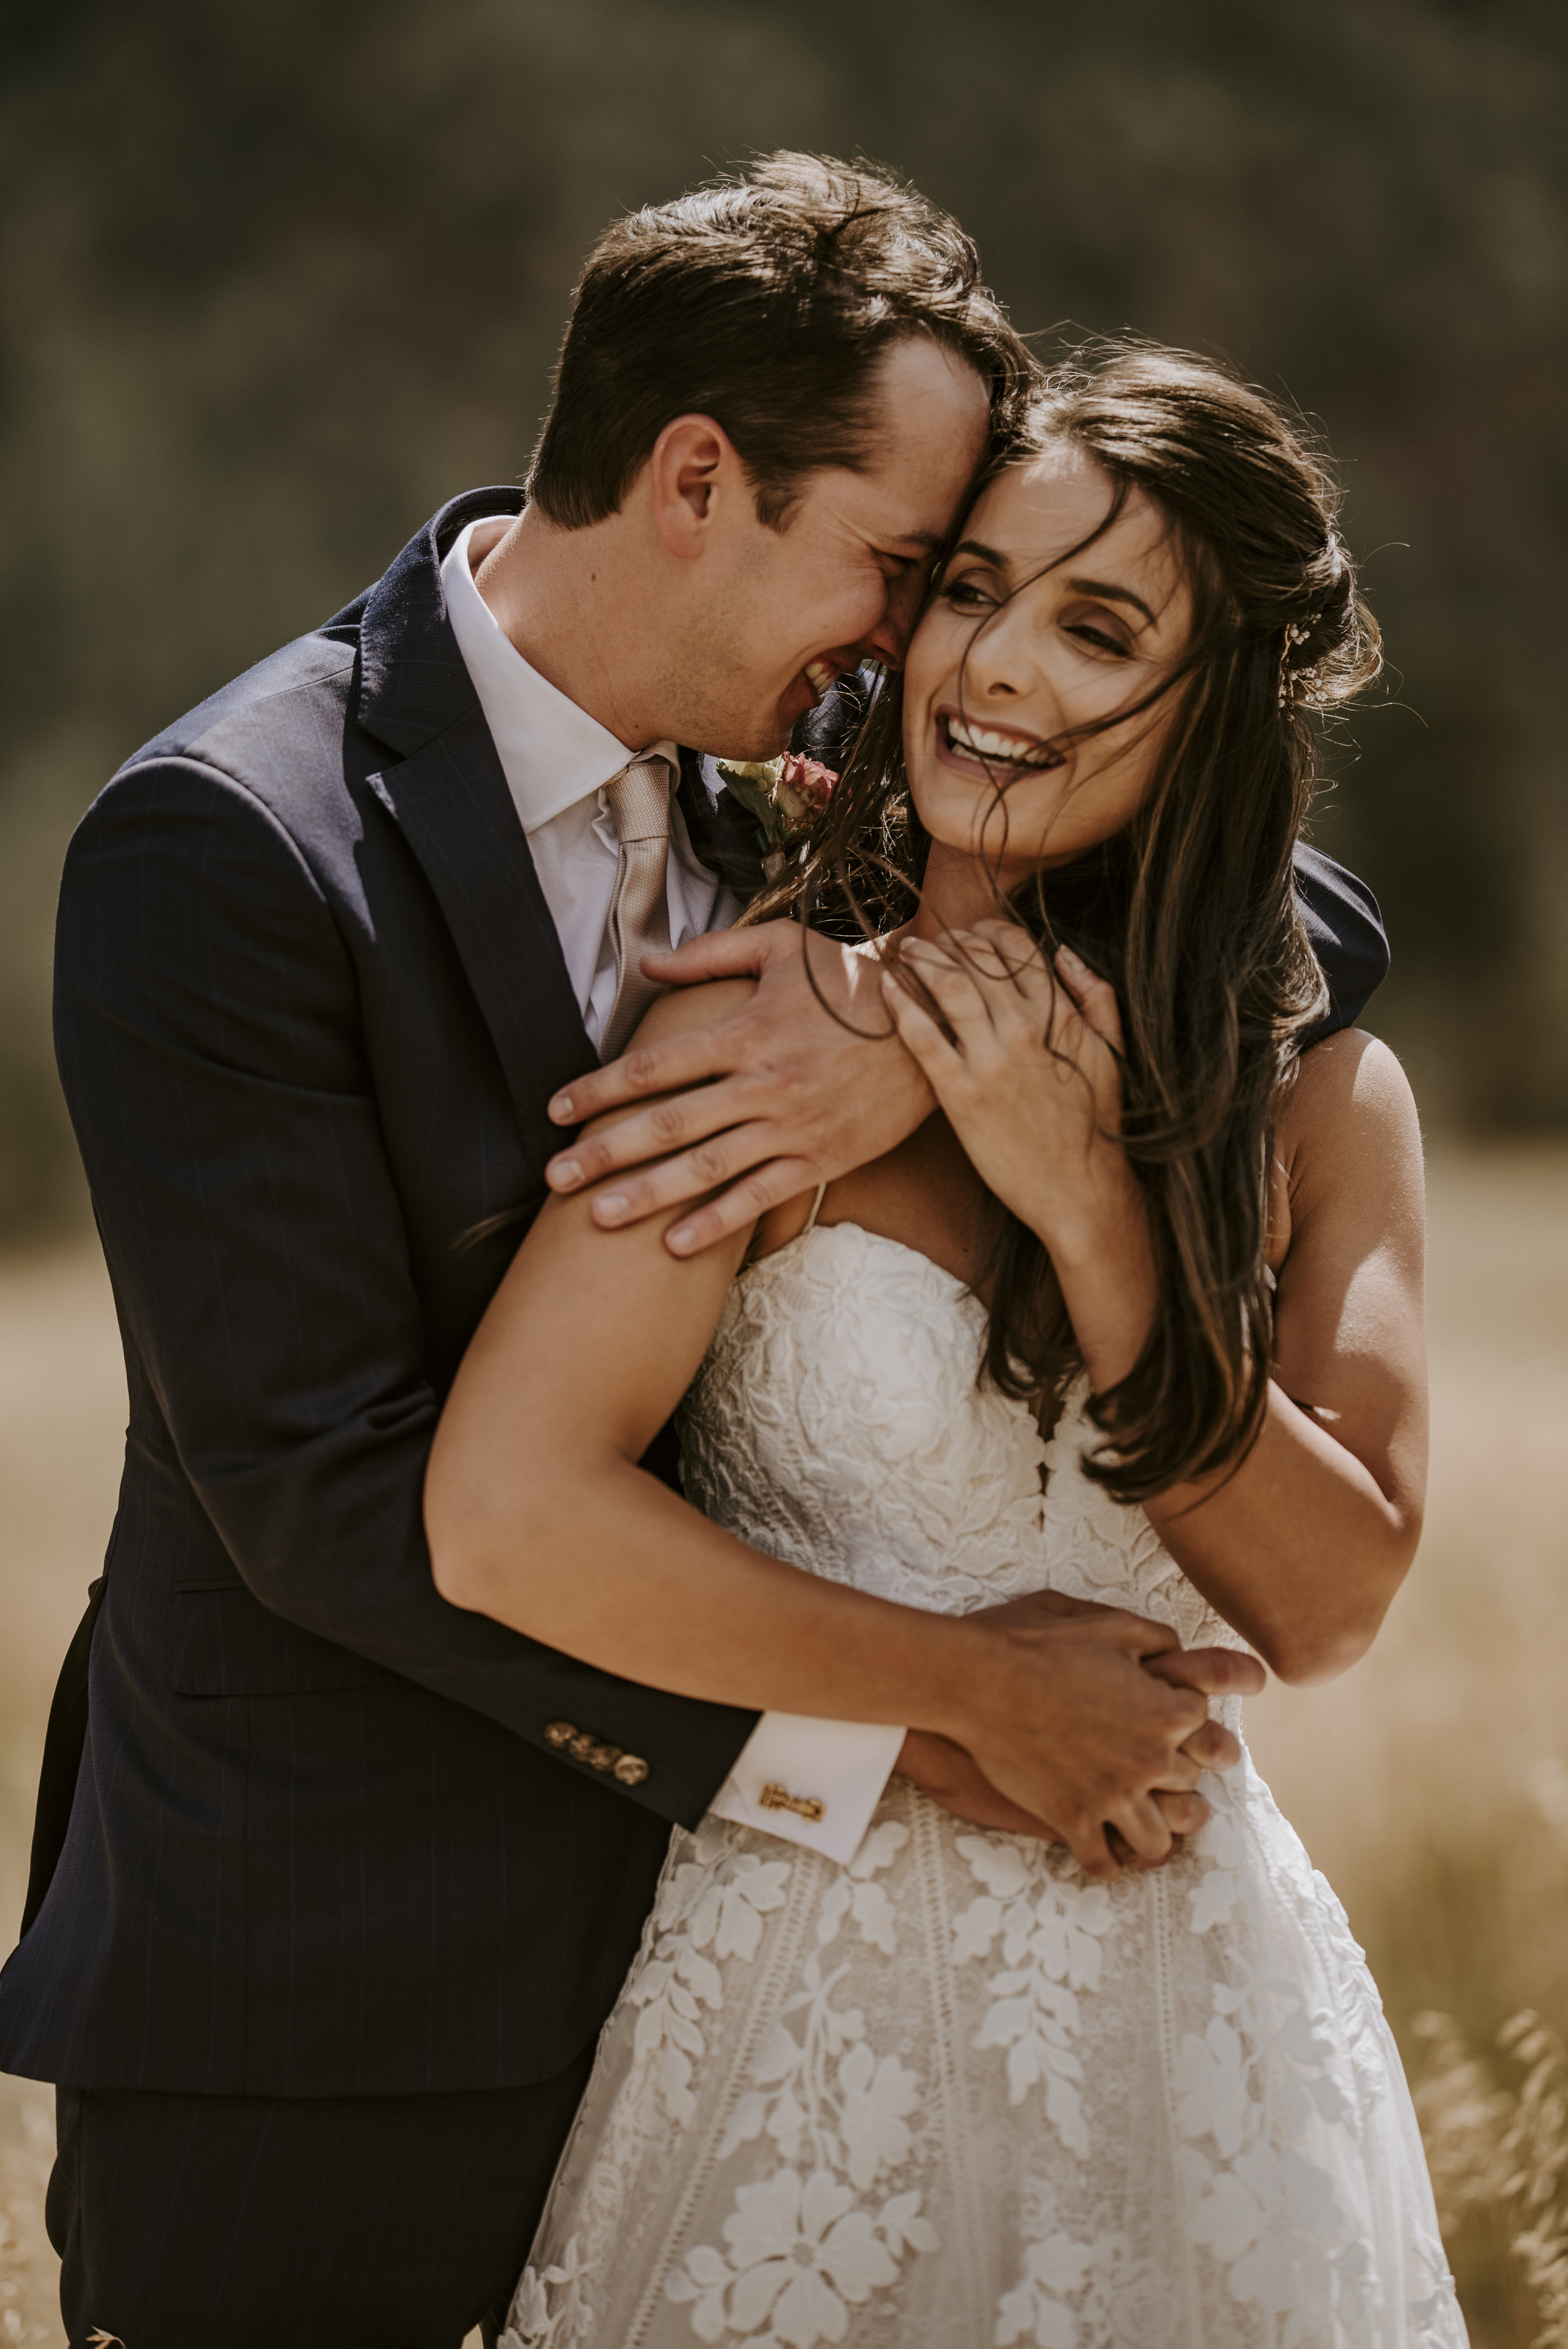 dallenbach_ranch_wedding_photographer